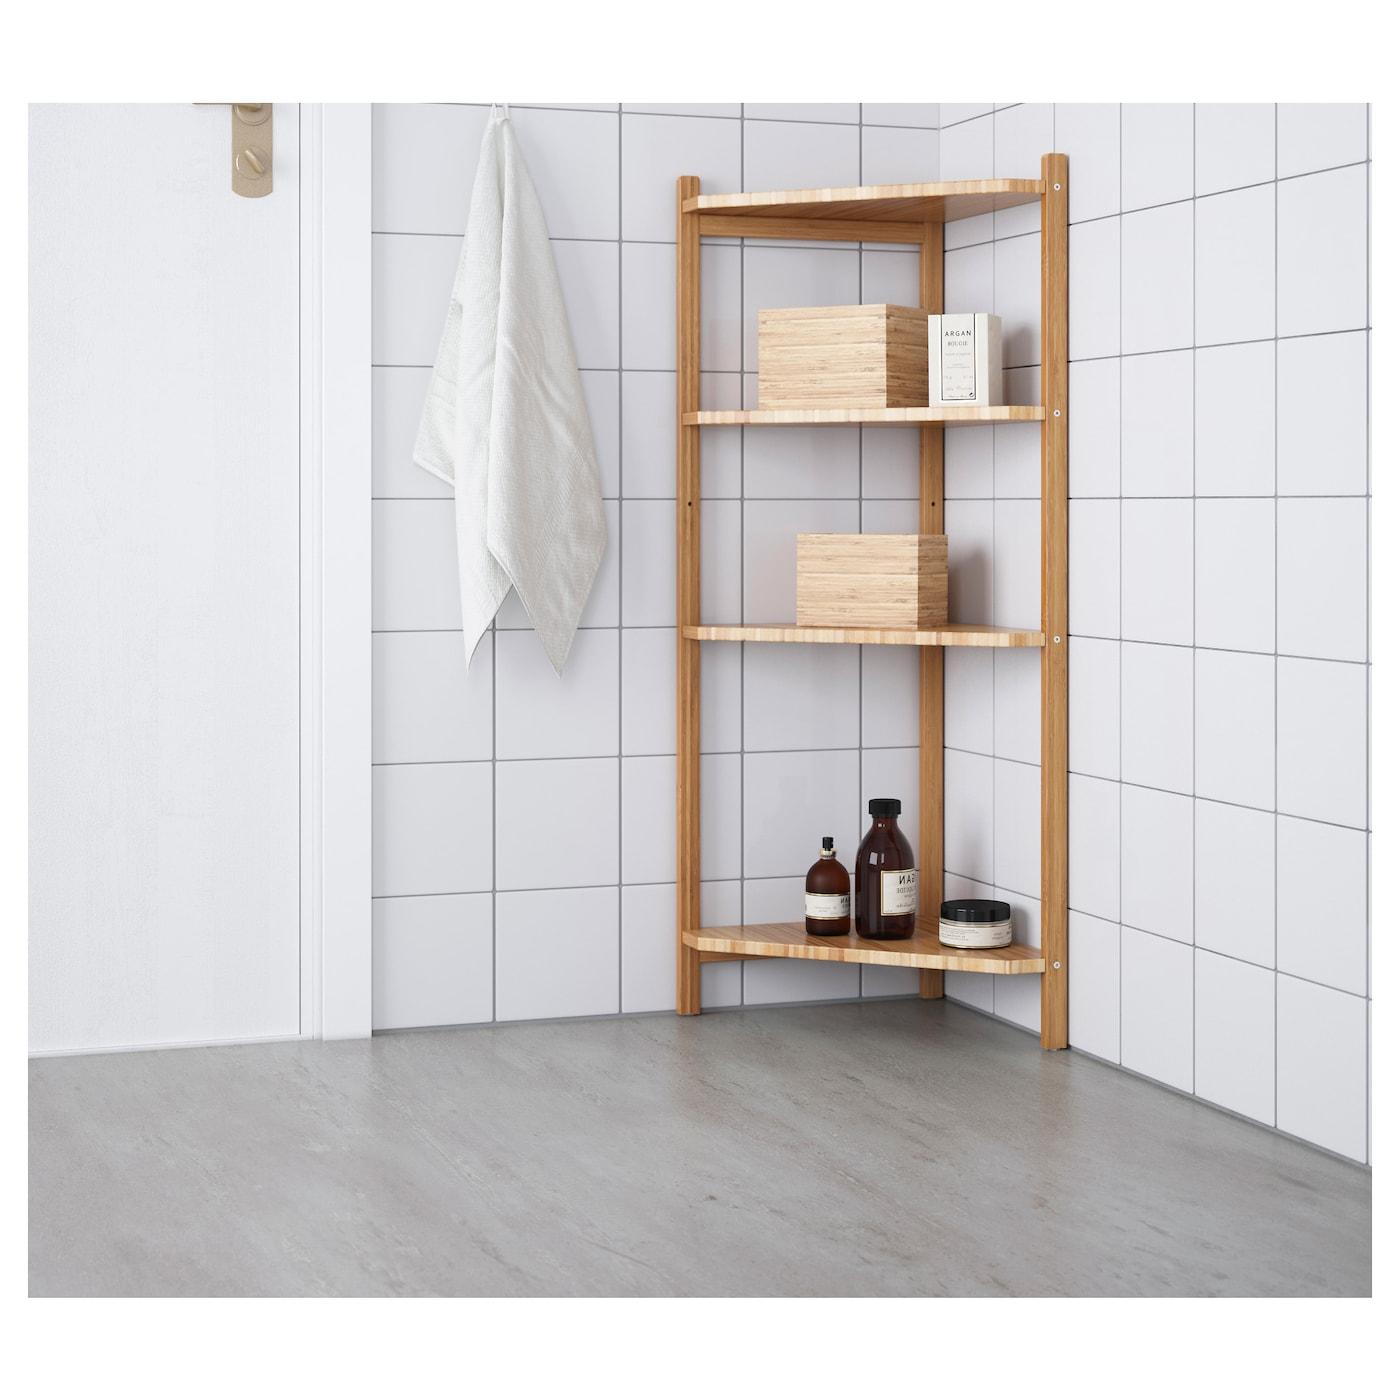 Bamboo bathroom shelf unit - Ikea R Grund Corner Shelf Unit Bamboo Is A Hardwearing Natural Material